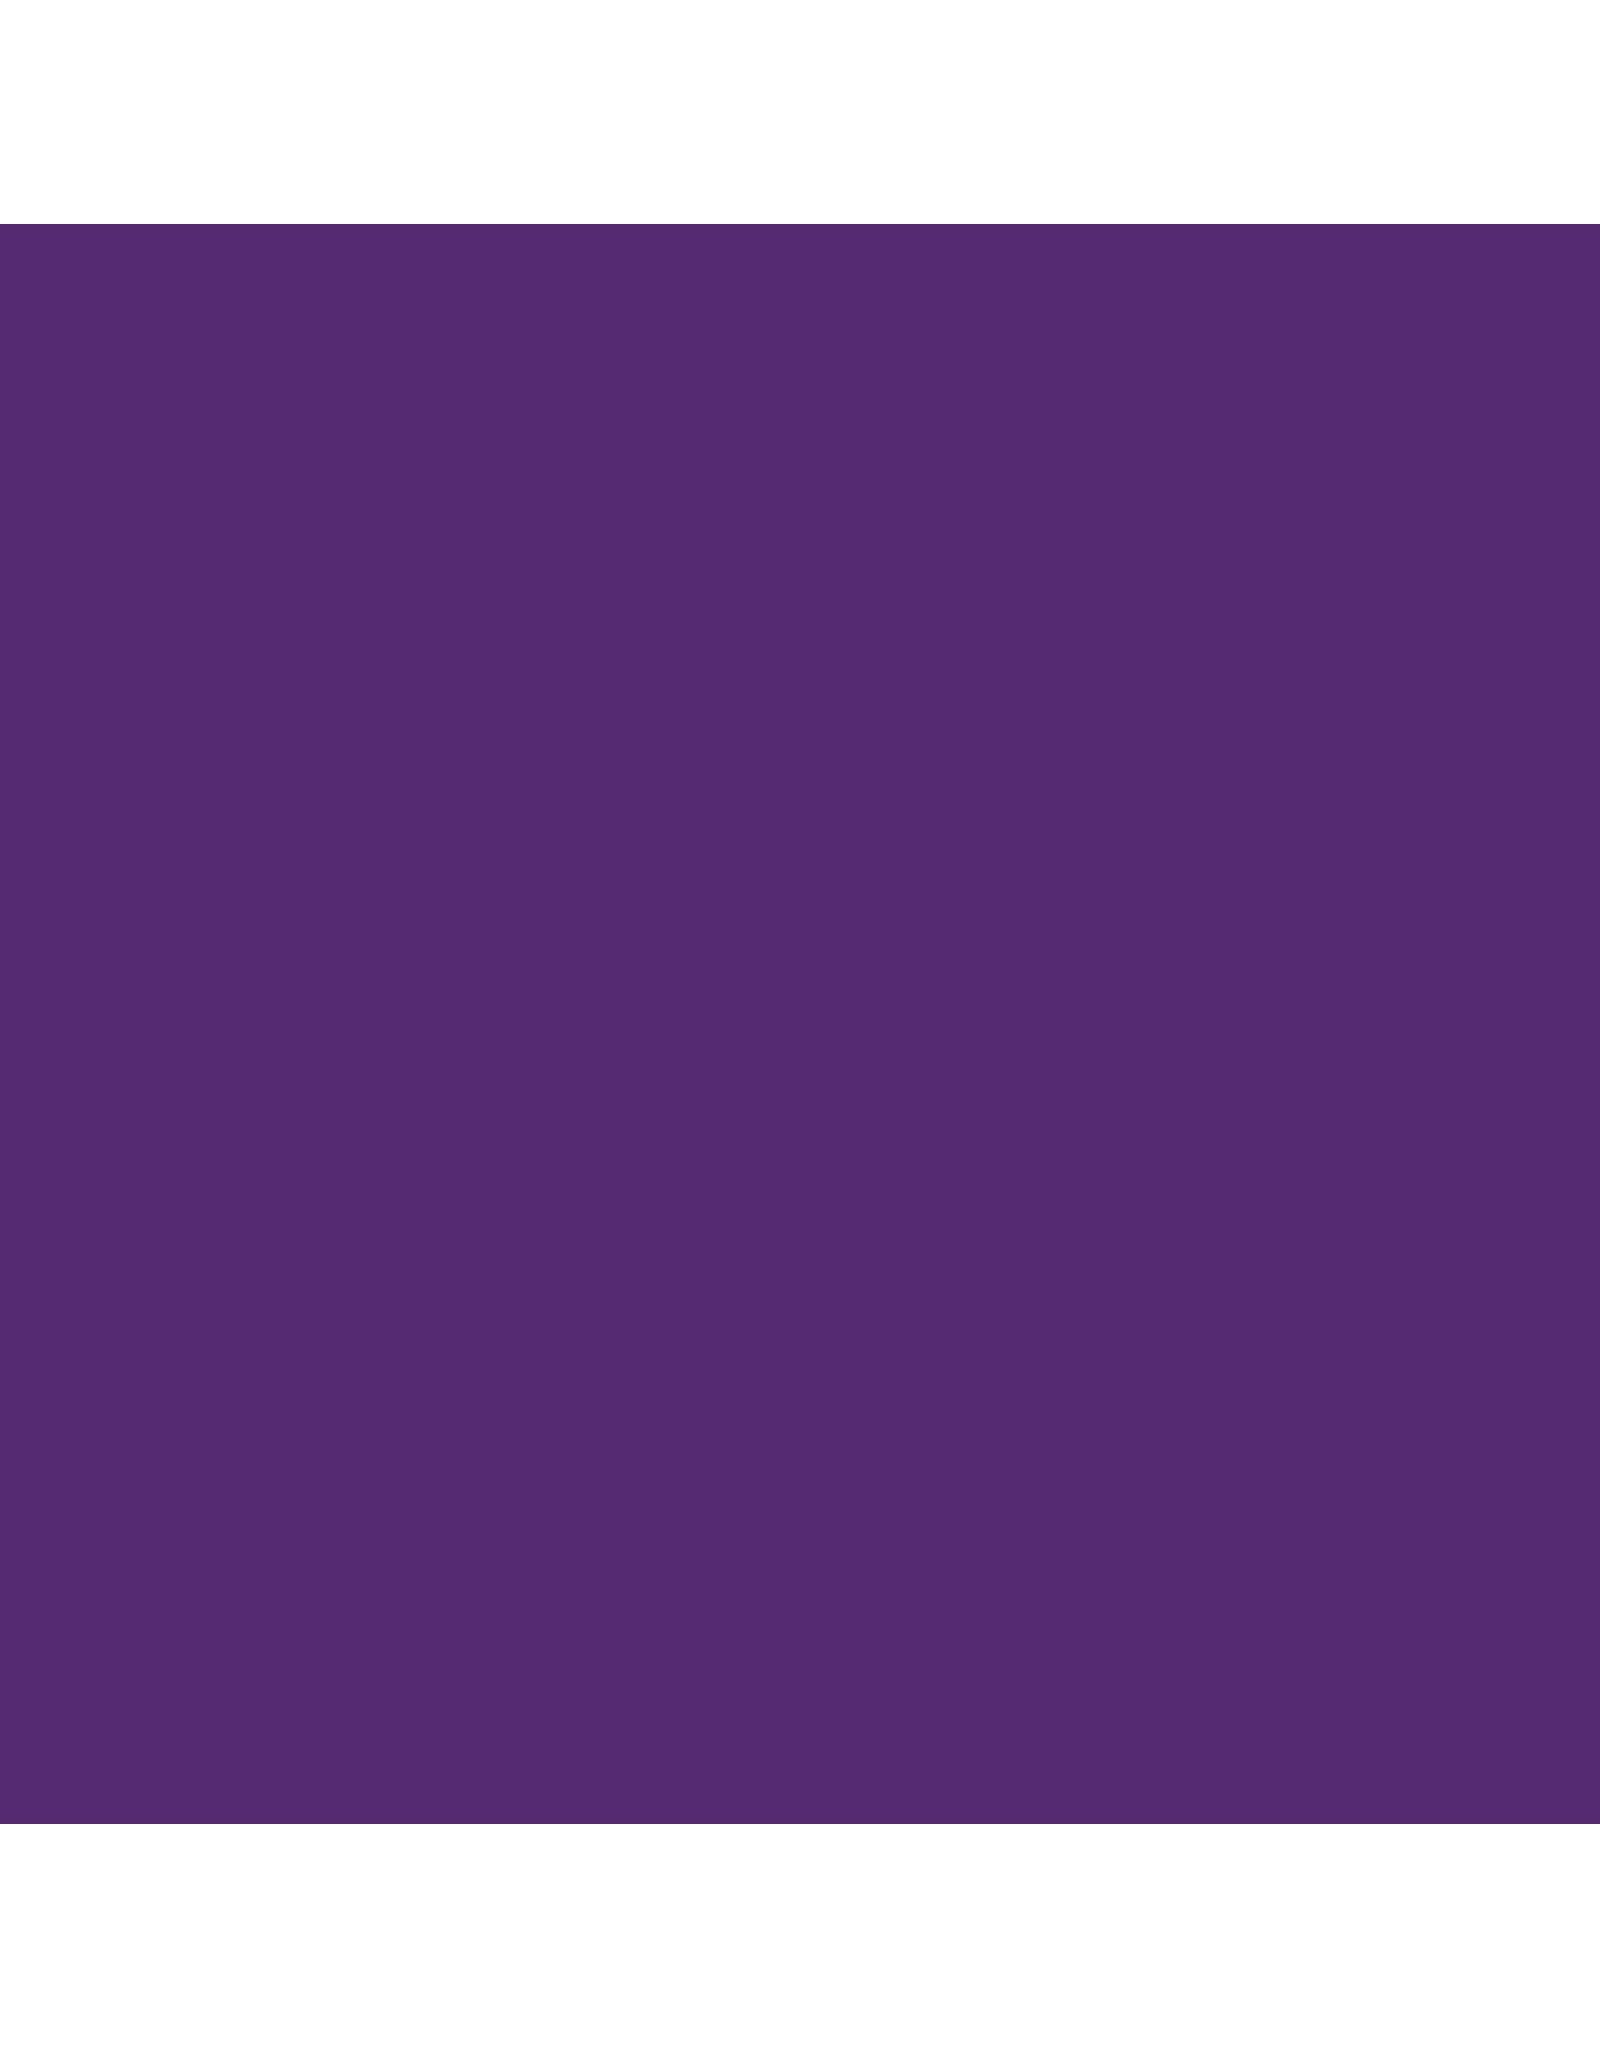 Privateer Press P3 Paint: Beaten Purple